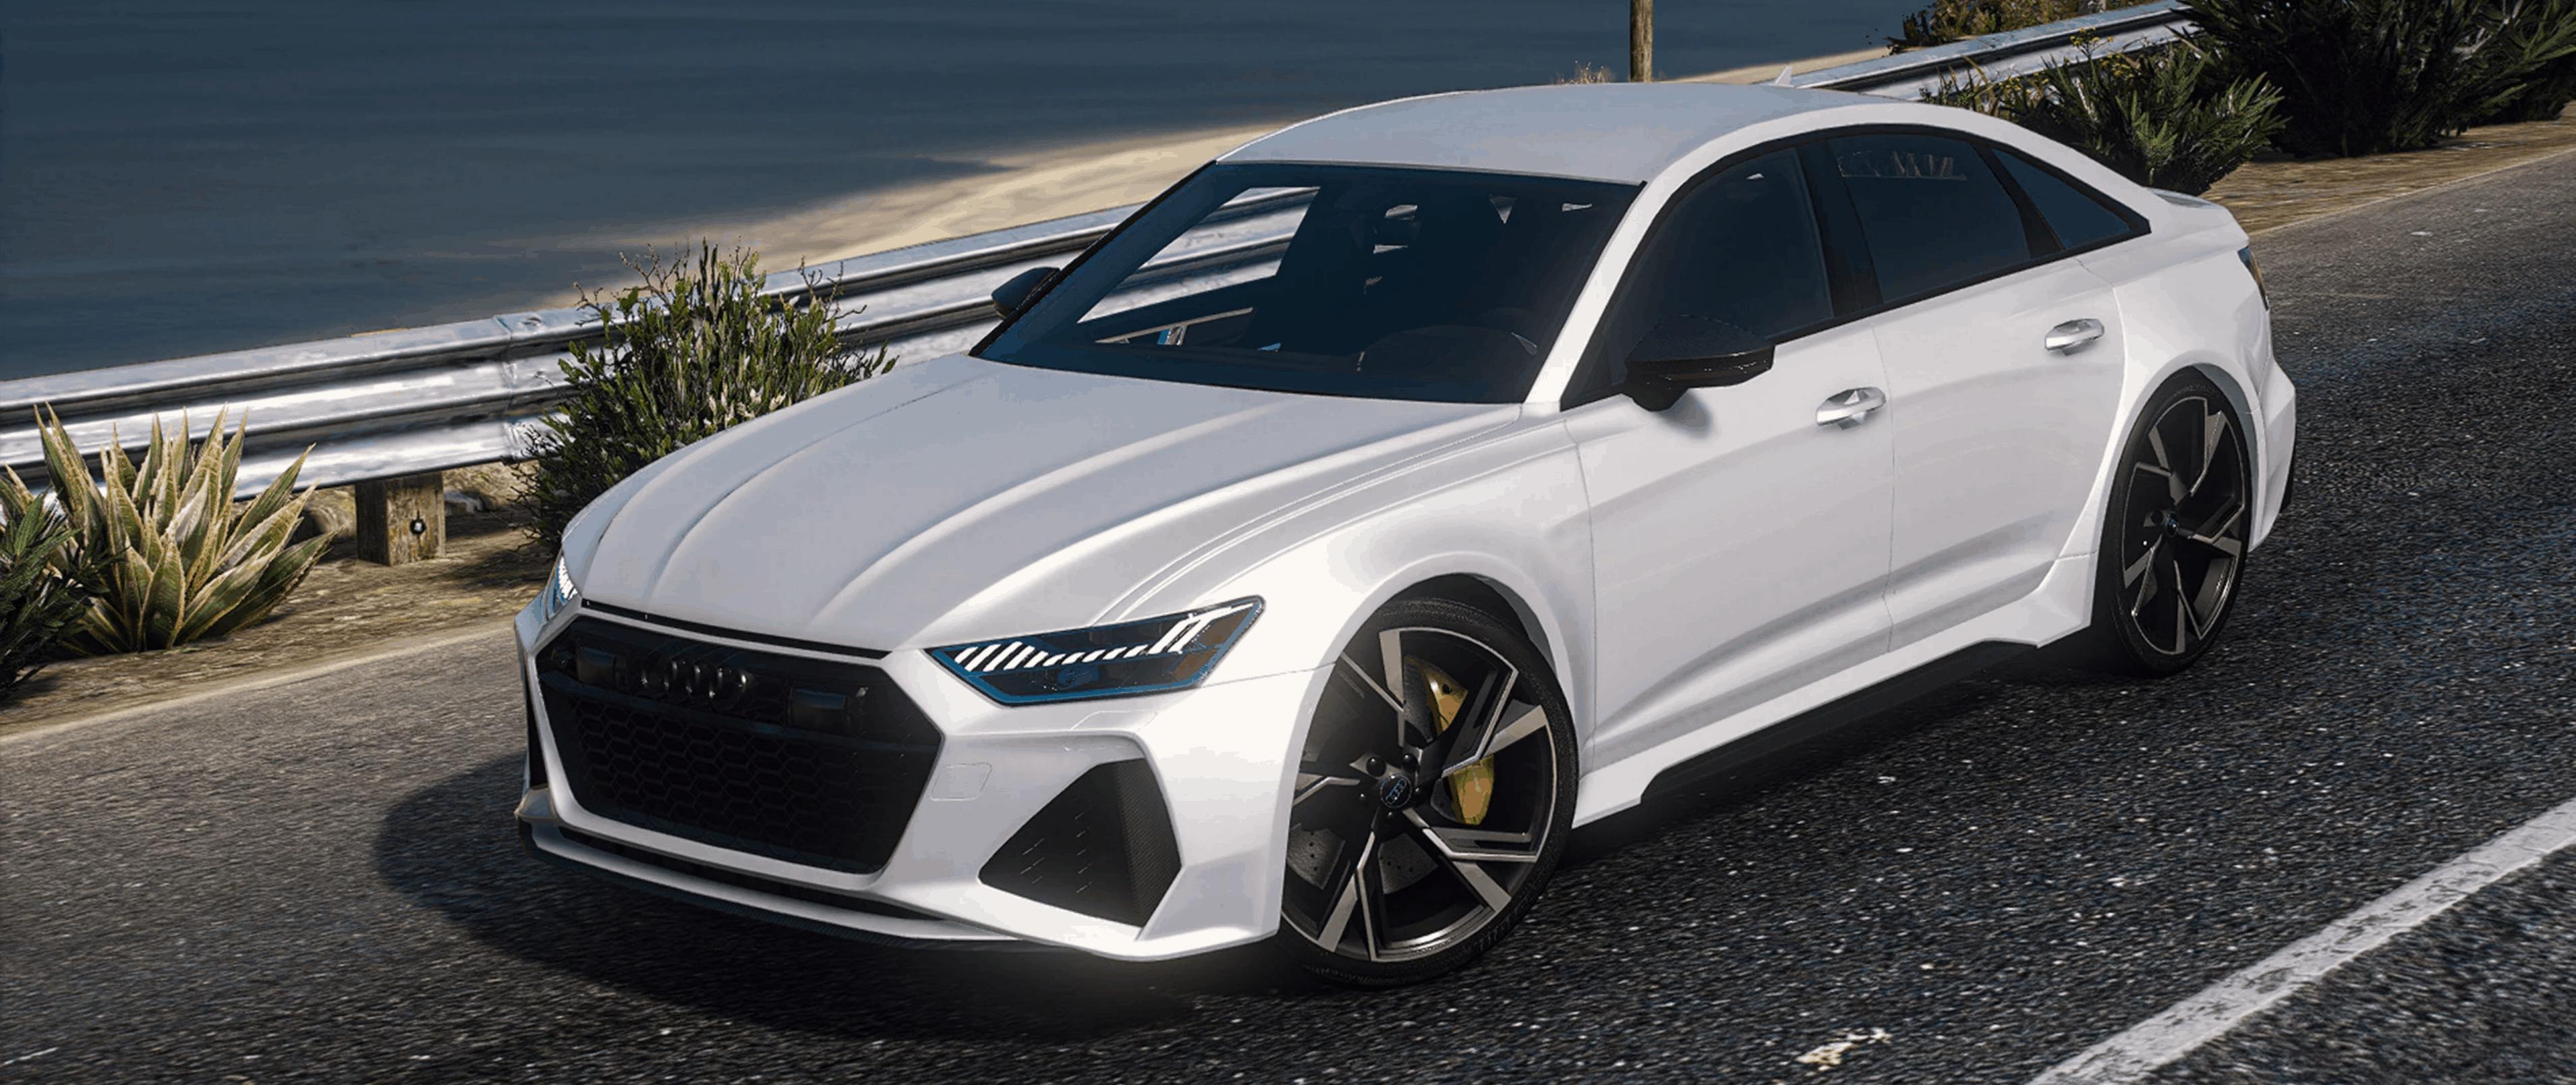 2021 Audi RS6 Sedan (C8) 1.0 - GTA 5 Mod | Grand Theft ...